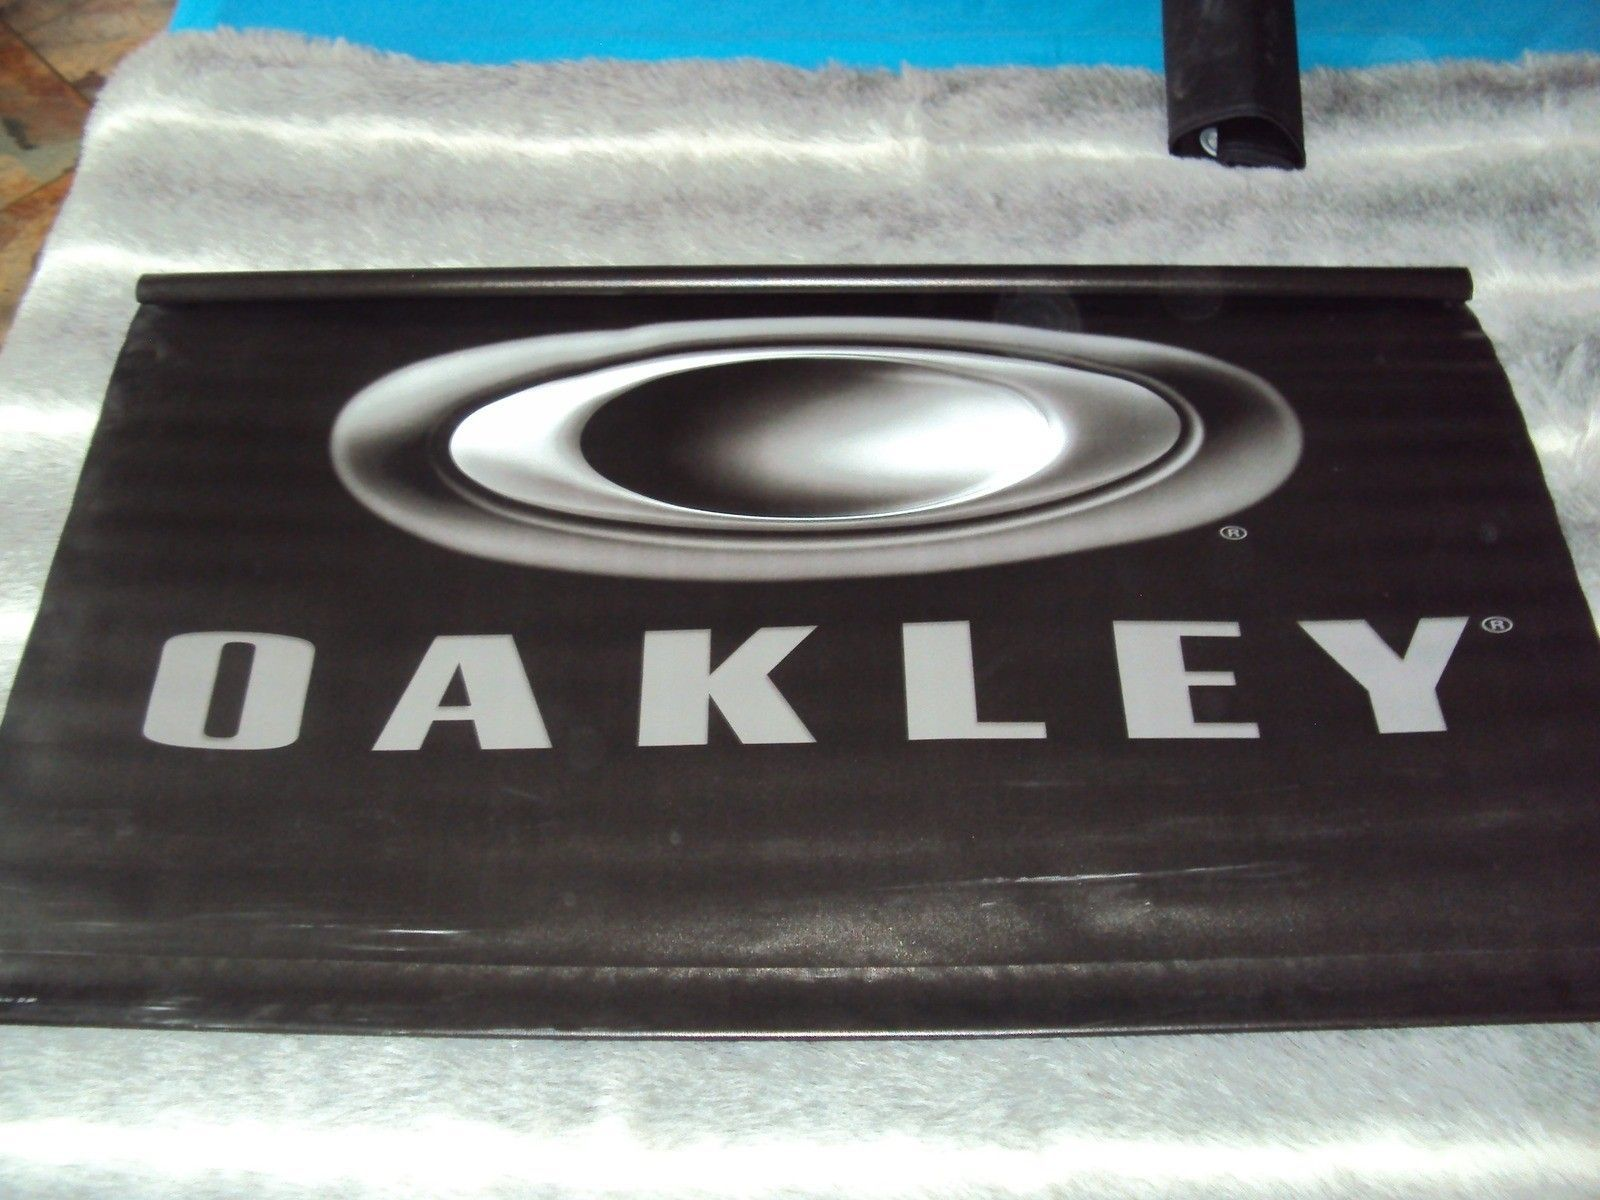 Oakley Frames And Cardboard Displays - 1347395882587.jpg